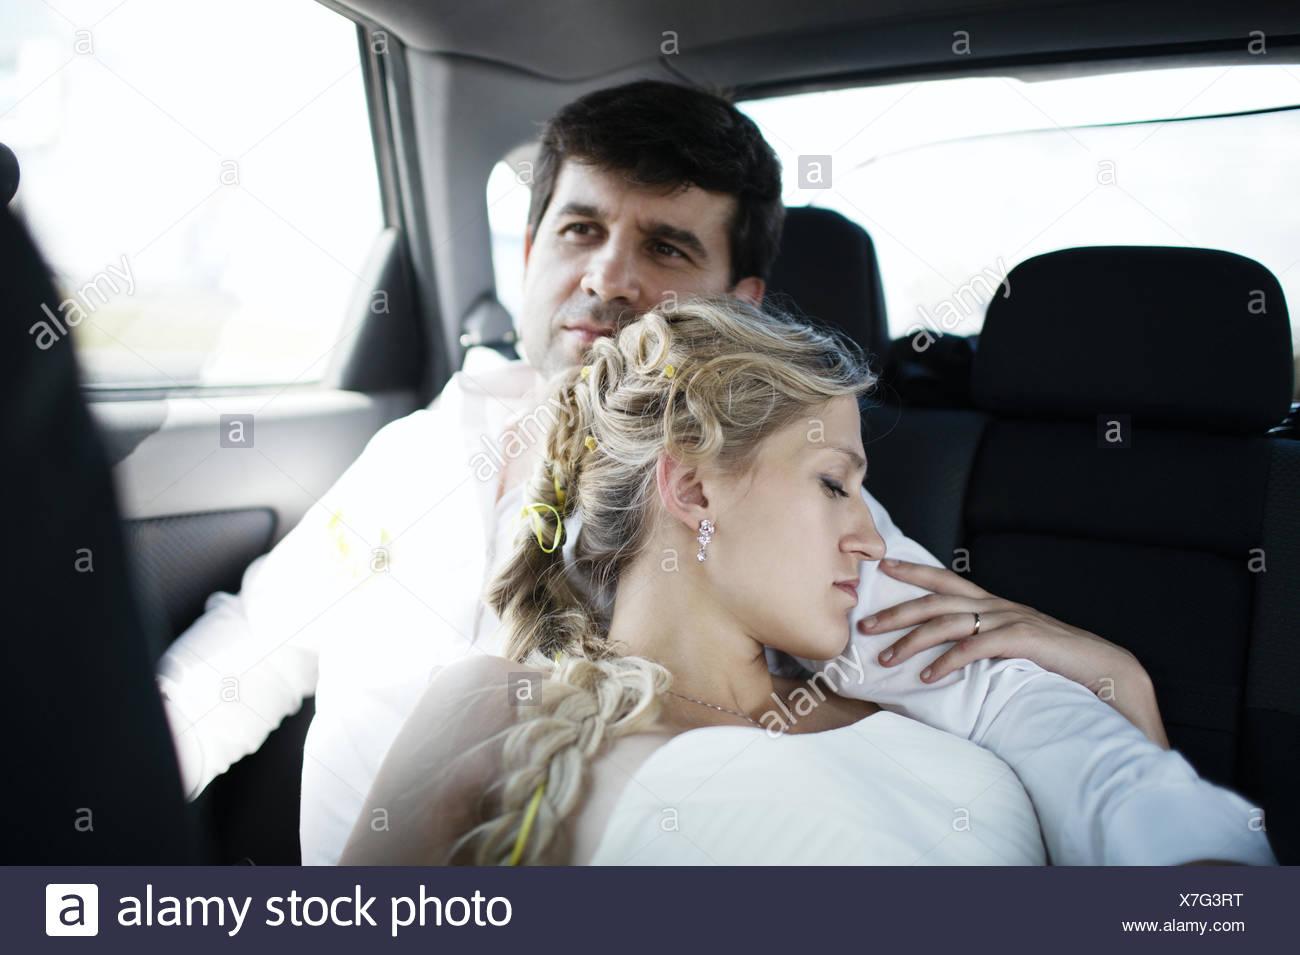 Woman sleeping on her husbands shoulder - Stock Image